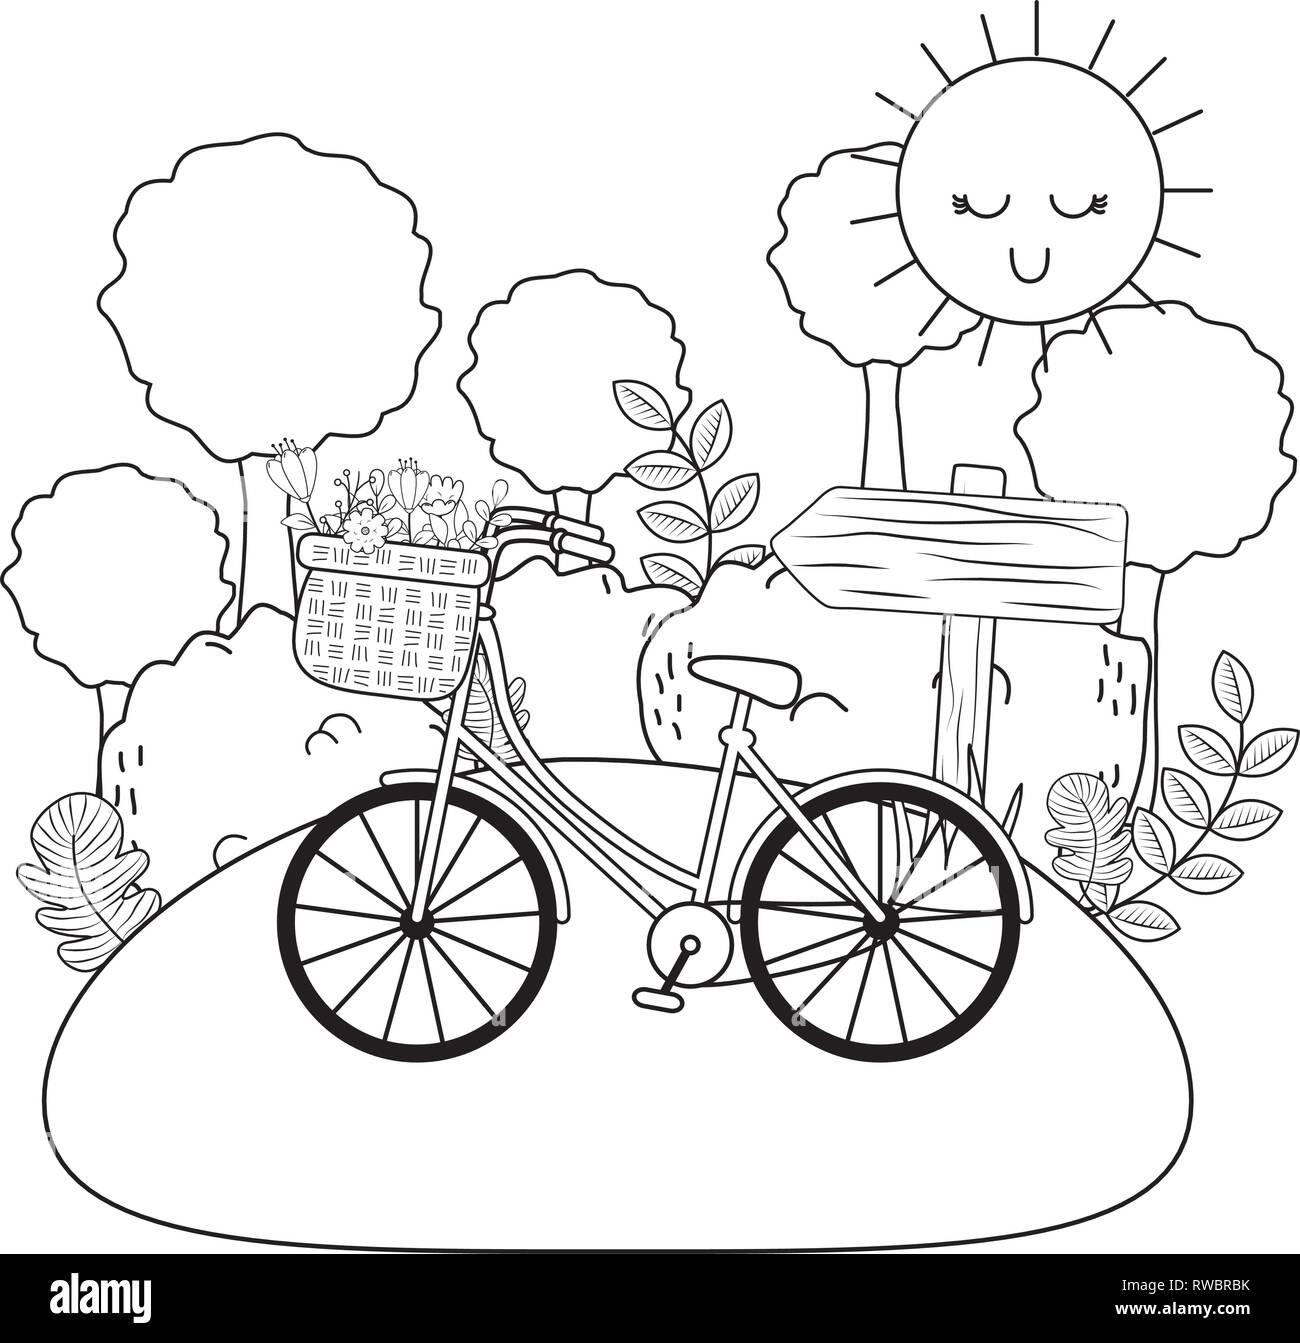 Flower Life Cycle Illustration Stock Photos Amp Flower Life